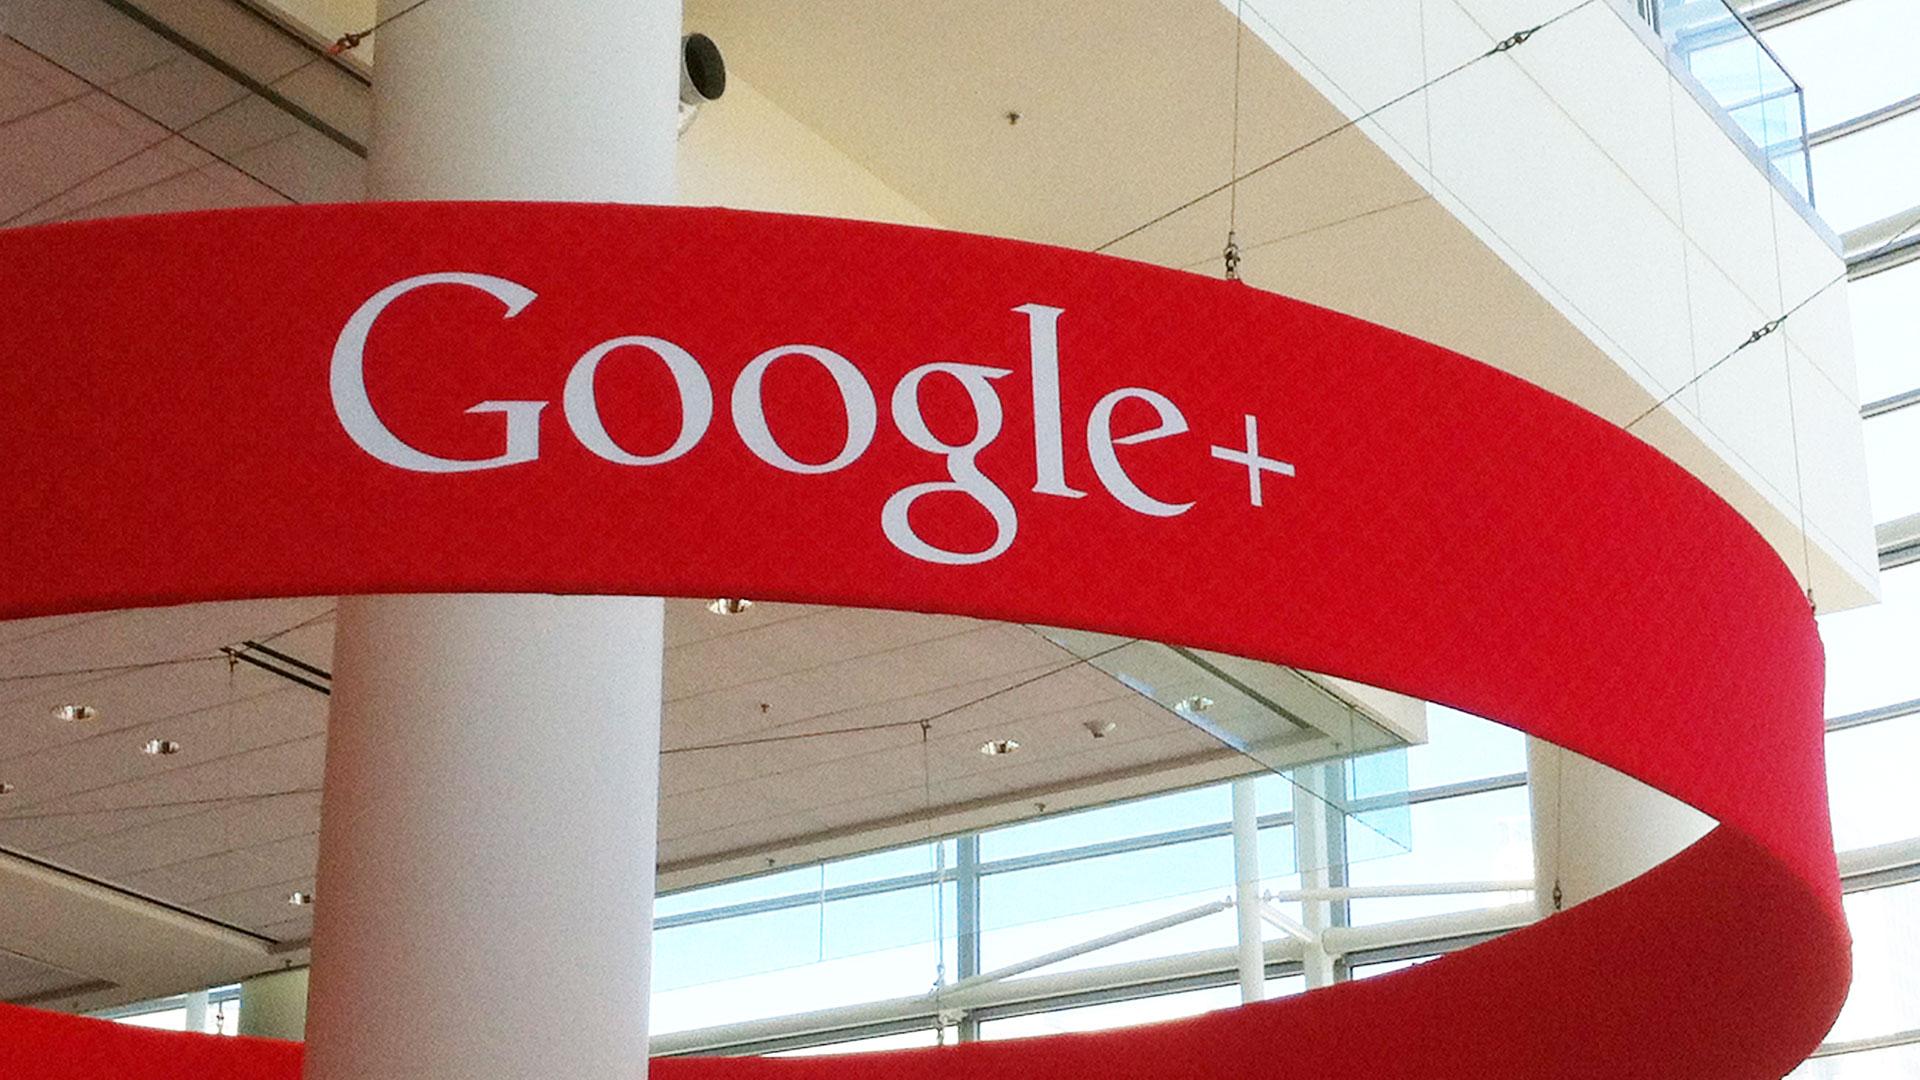 Google+ users, google+ to shut down, Google+ bug, Gadgets News